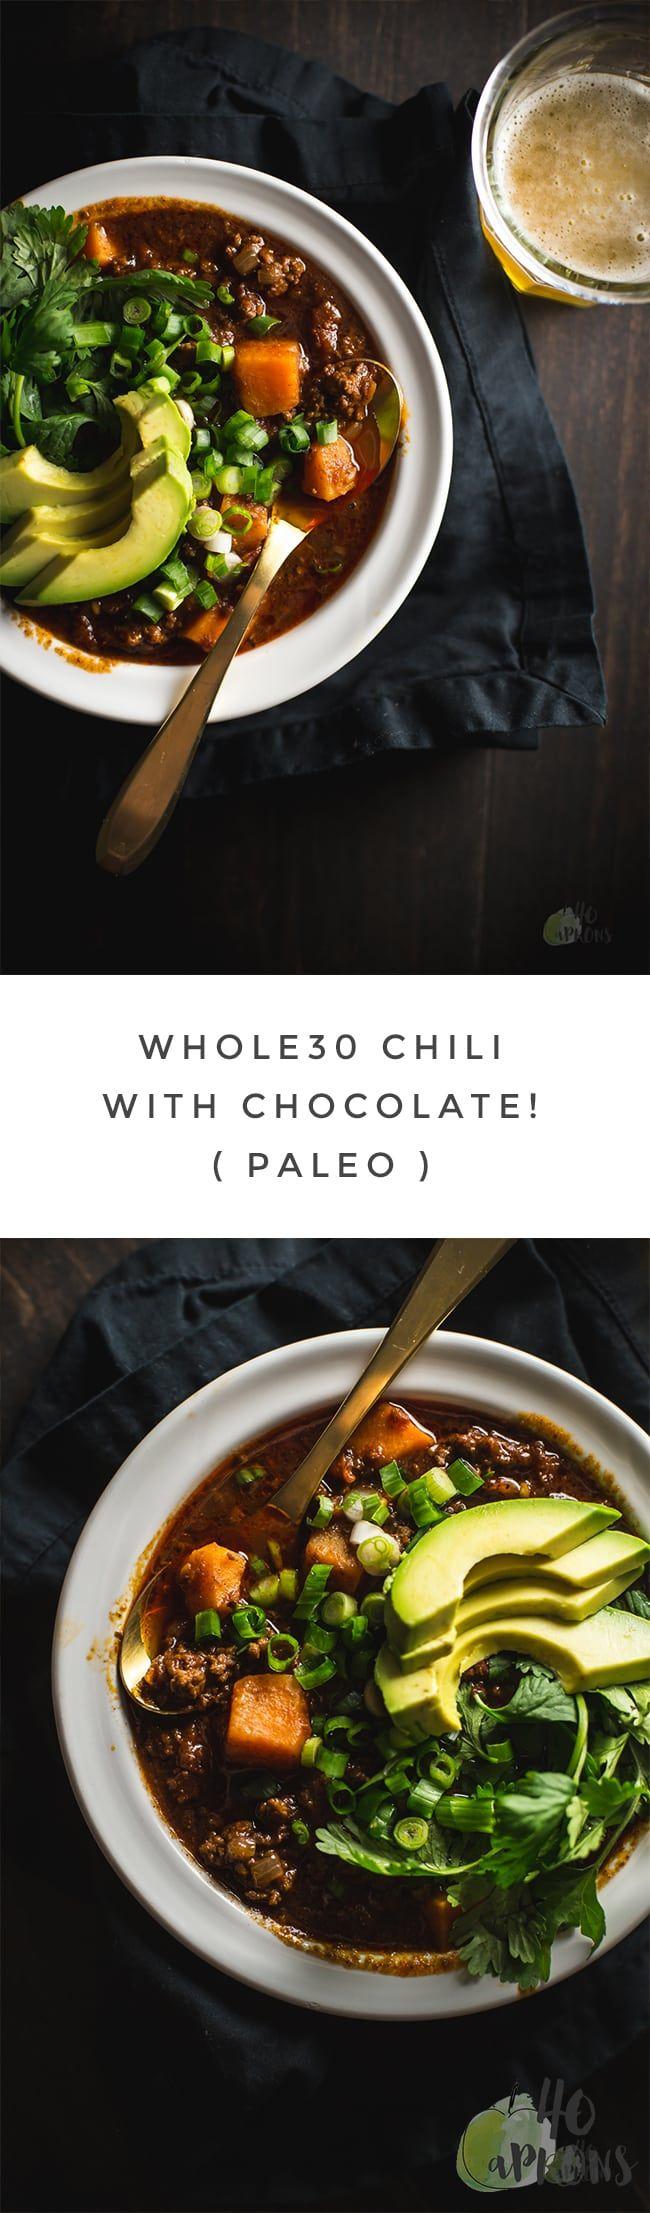 Whole30 Chili (with Chocolate!) - Paleo // 40 Aprons